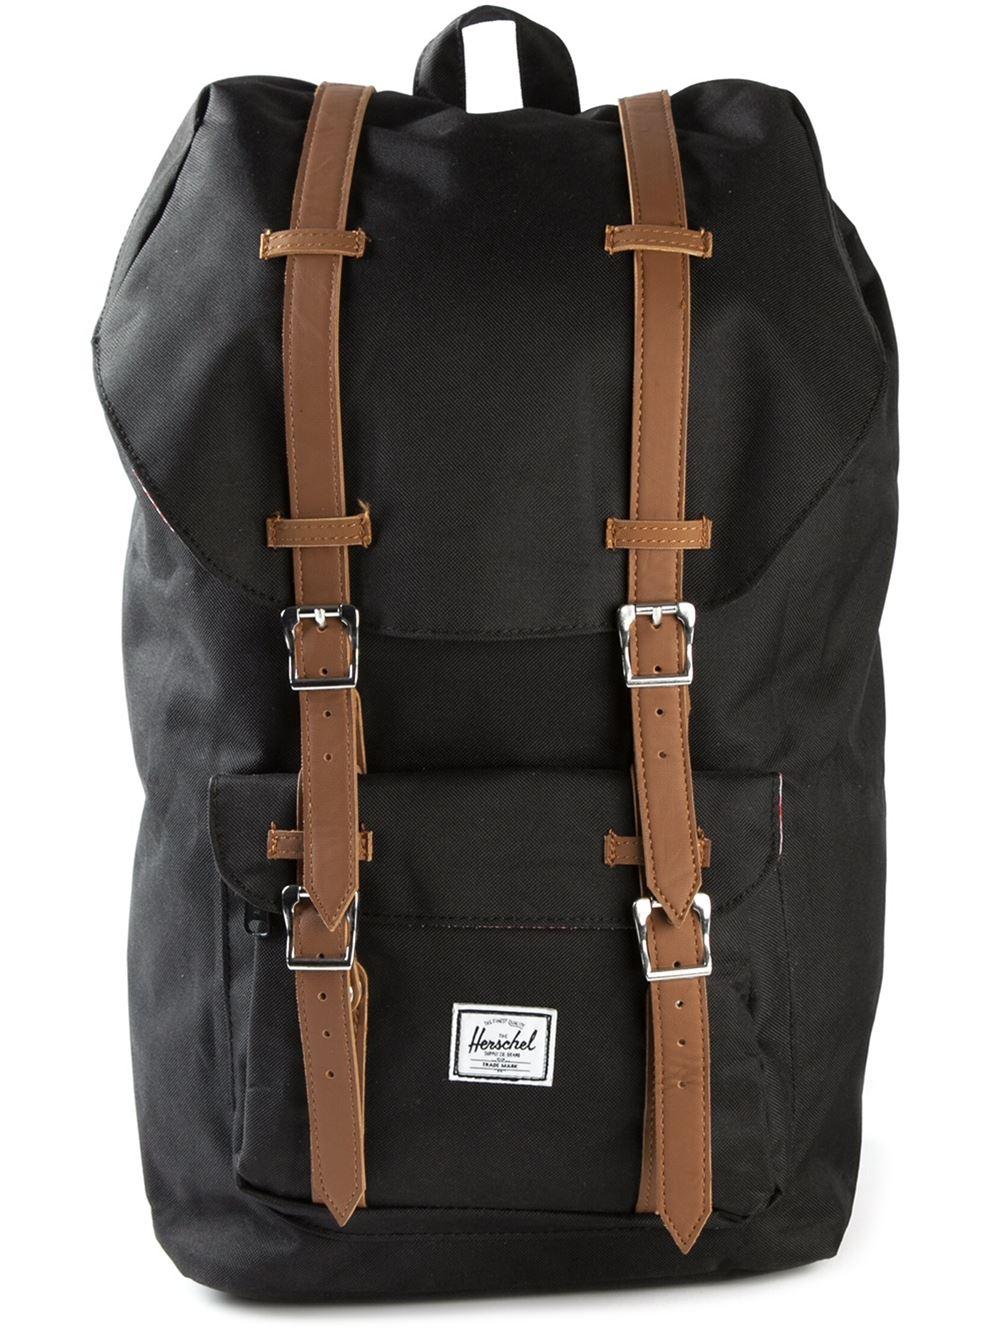 Lyst - Herschel Supply Co. 'Little America' Backpack in Black for Men